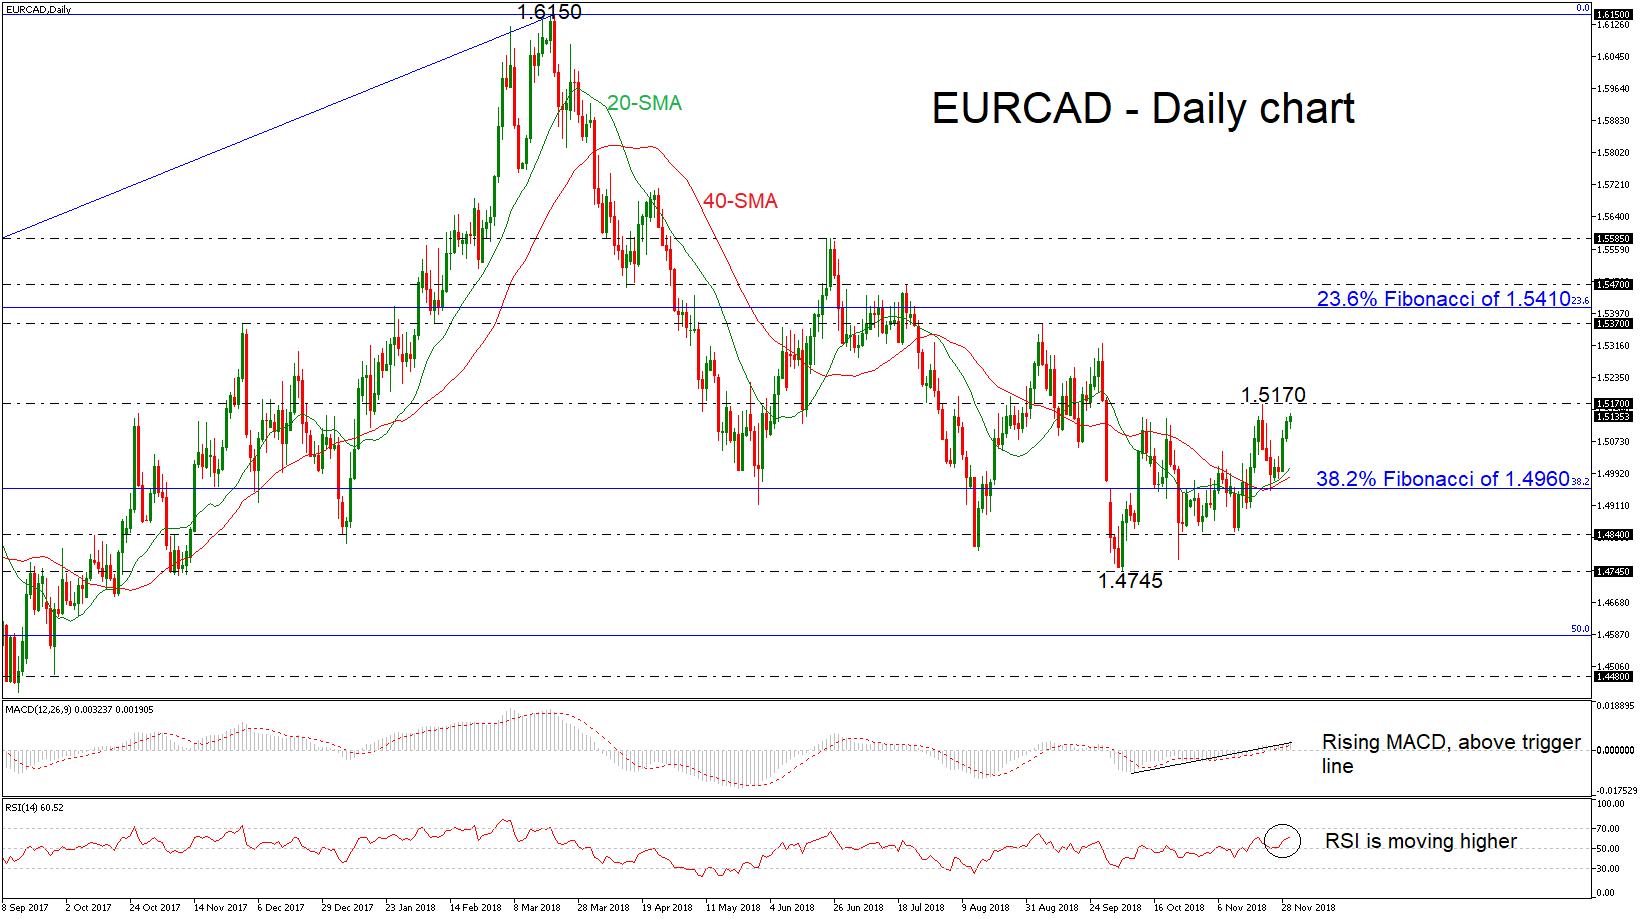 EUR/CAD 30/11/18 | EconAlerts